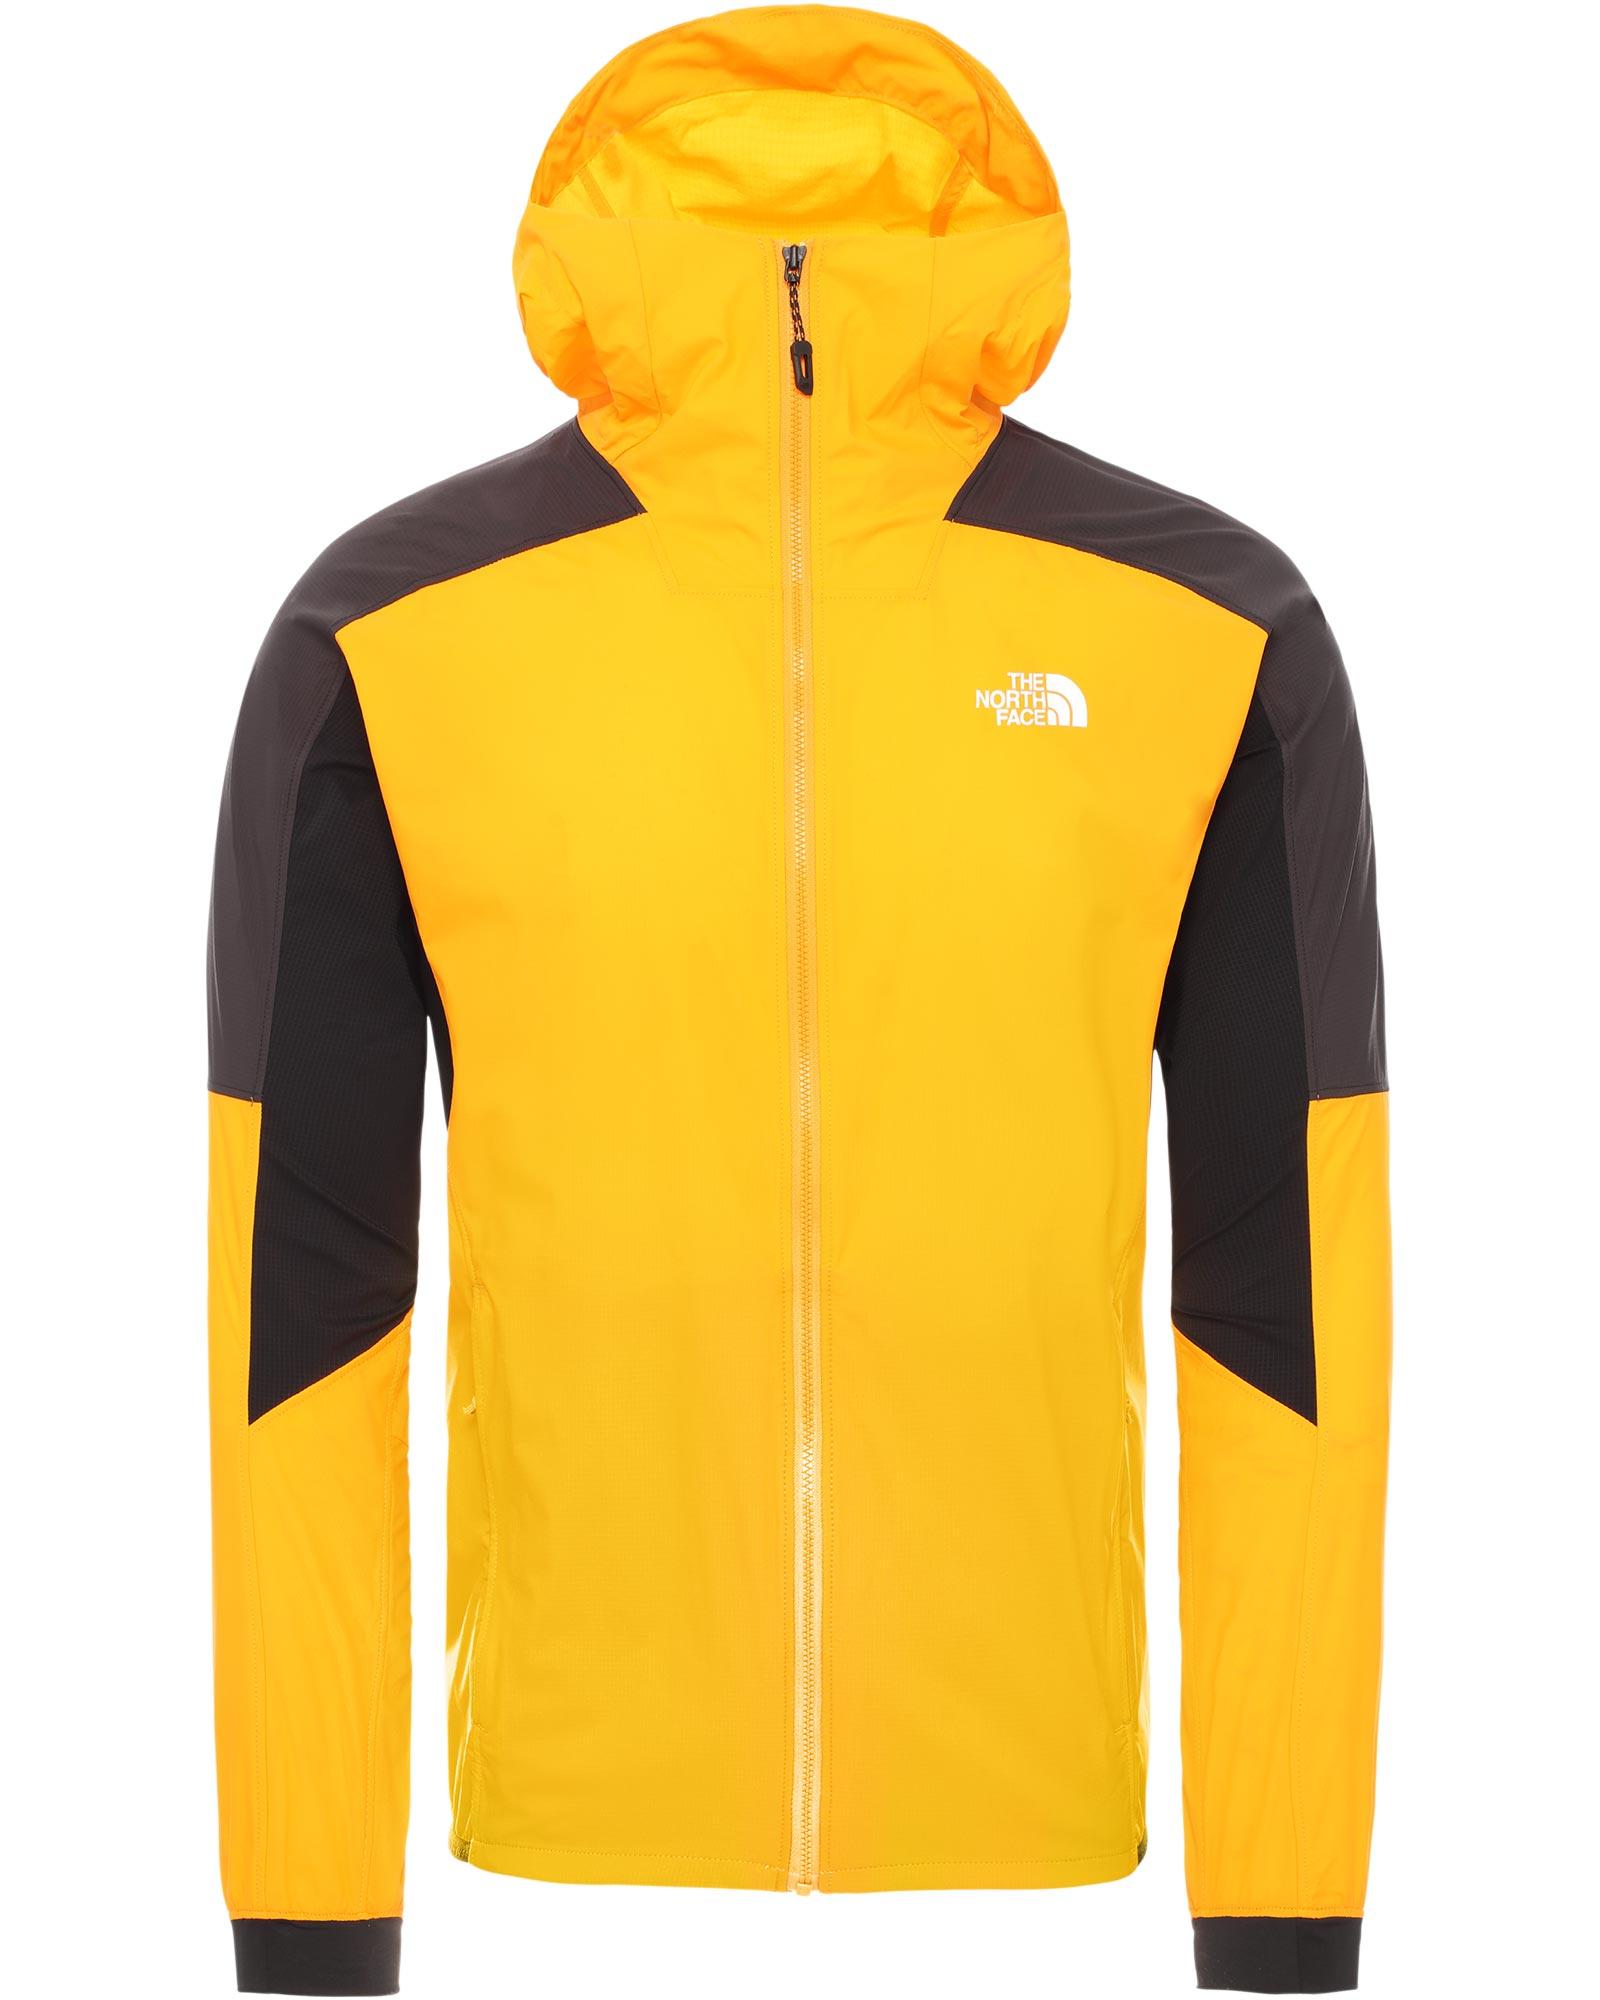 The North Face Men's Impendor Light Wind Jacket 0